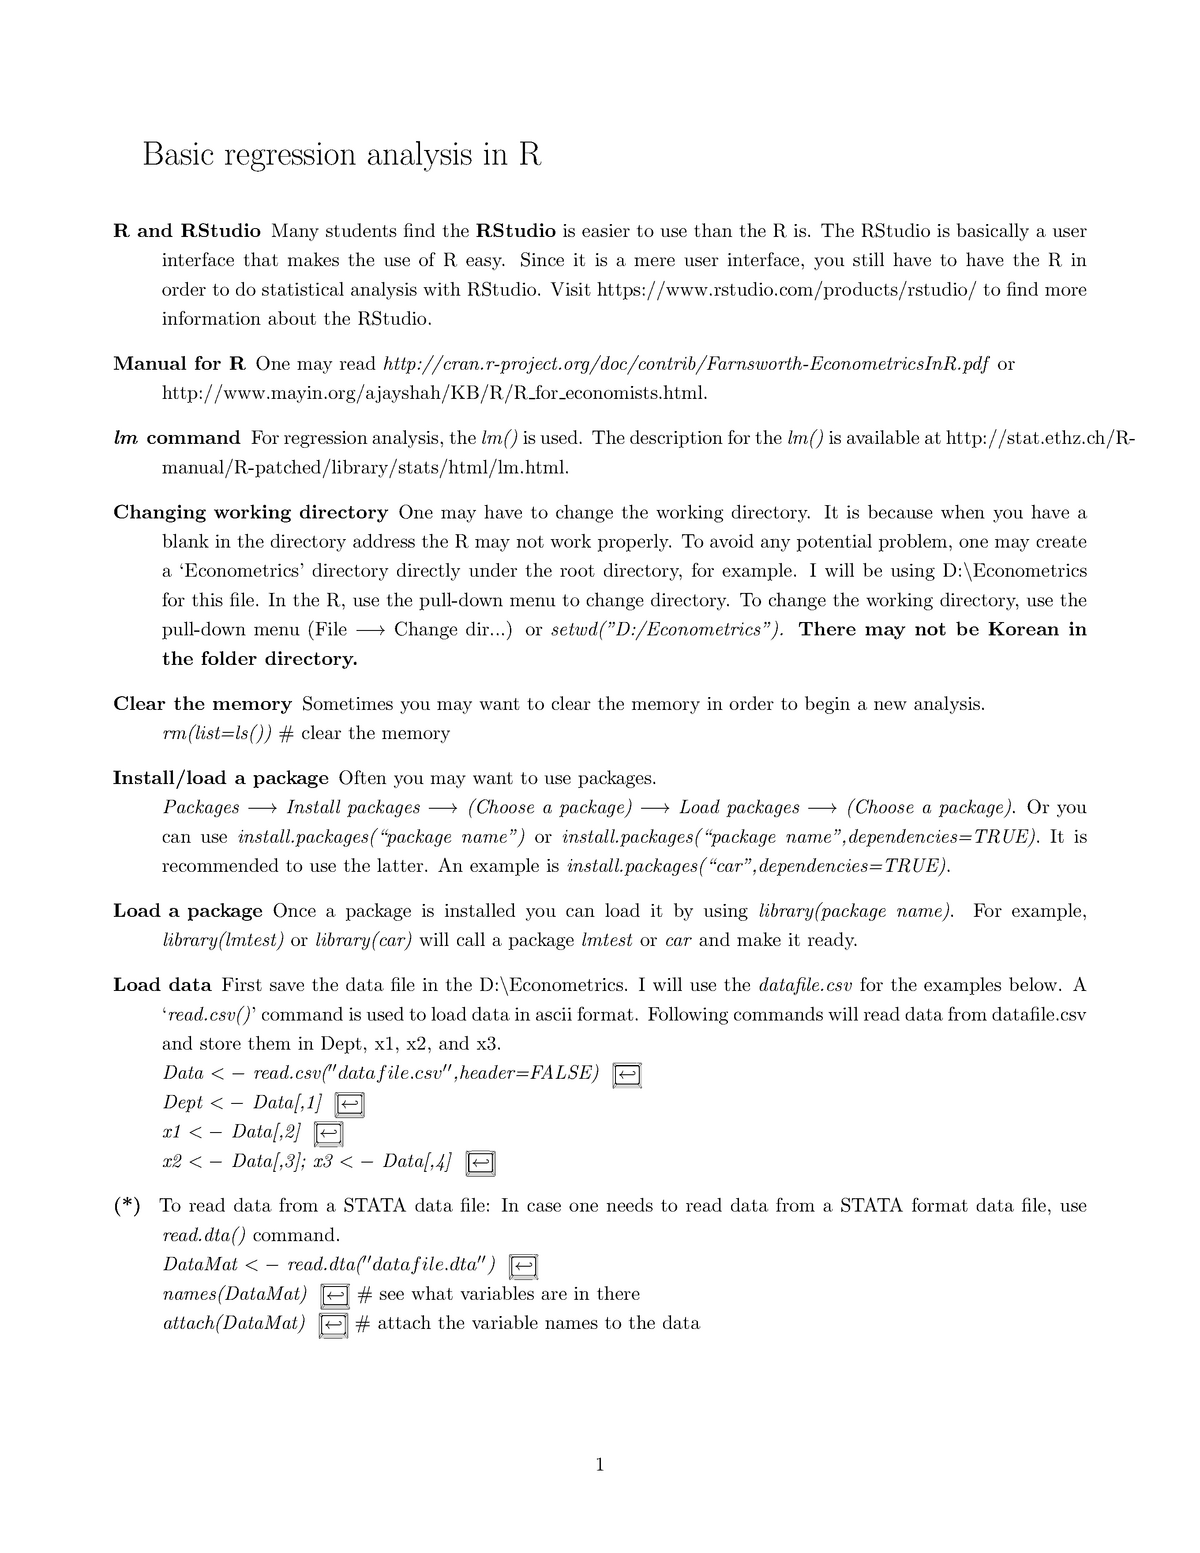 Introductions for using R - ECONOMETRICS I(English) ECON301 - StuDocu